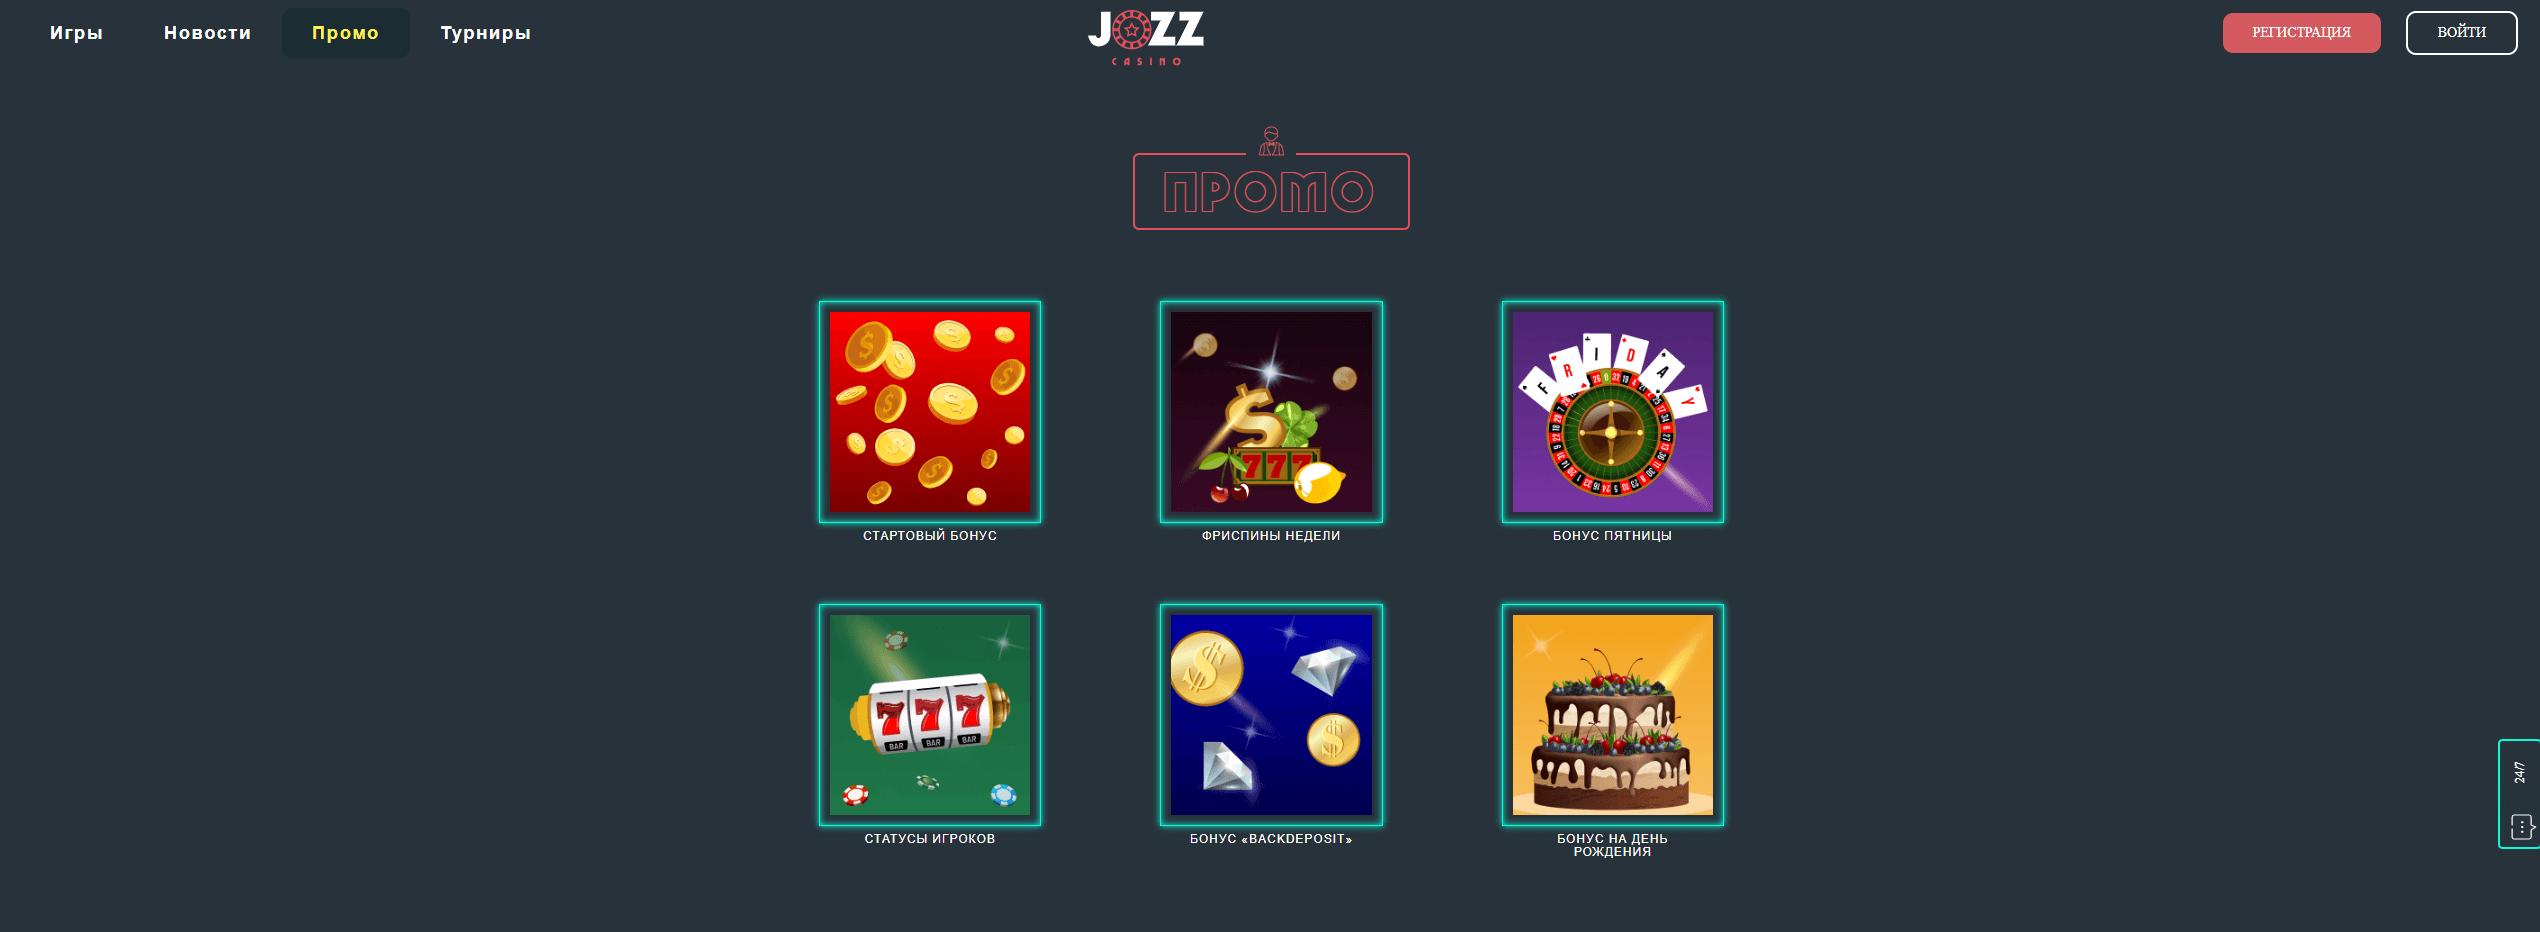 jozz casino акции и бонусы